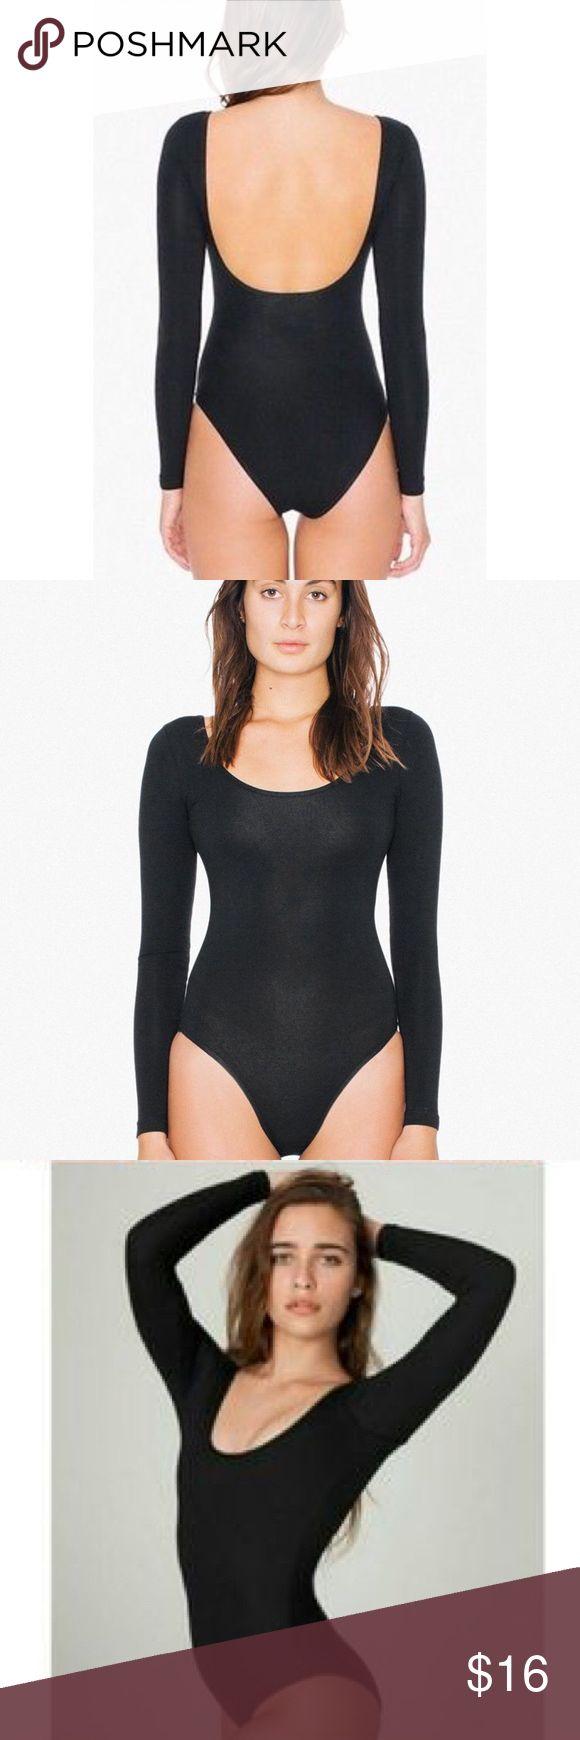 American Apparel Bodysuit Black, long sleeved, scoop back. Great condition. American Apparel Tops